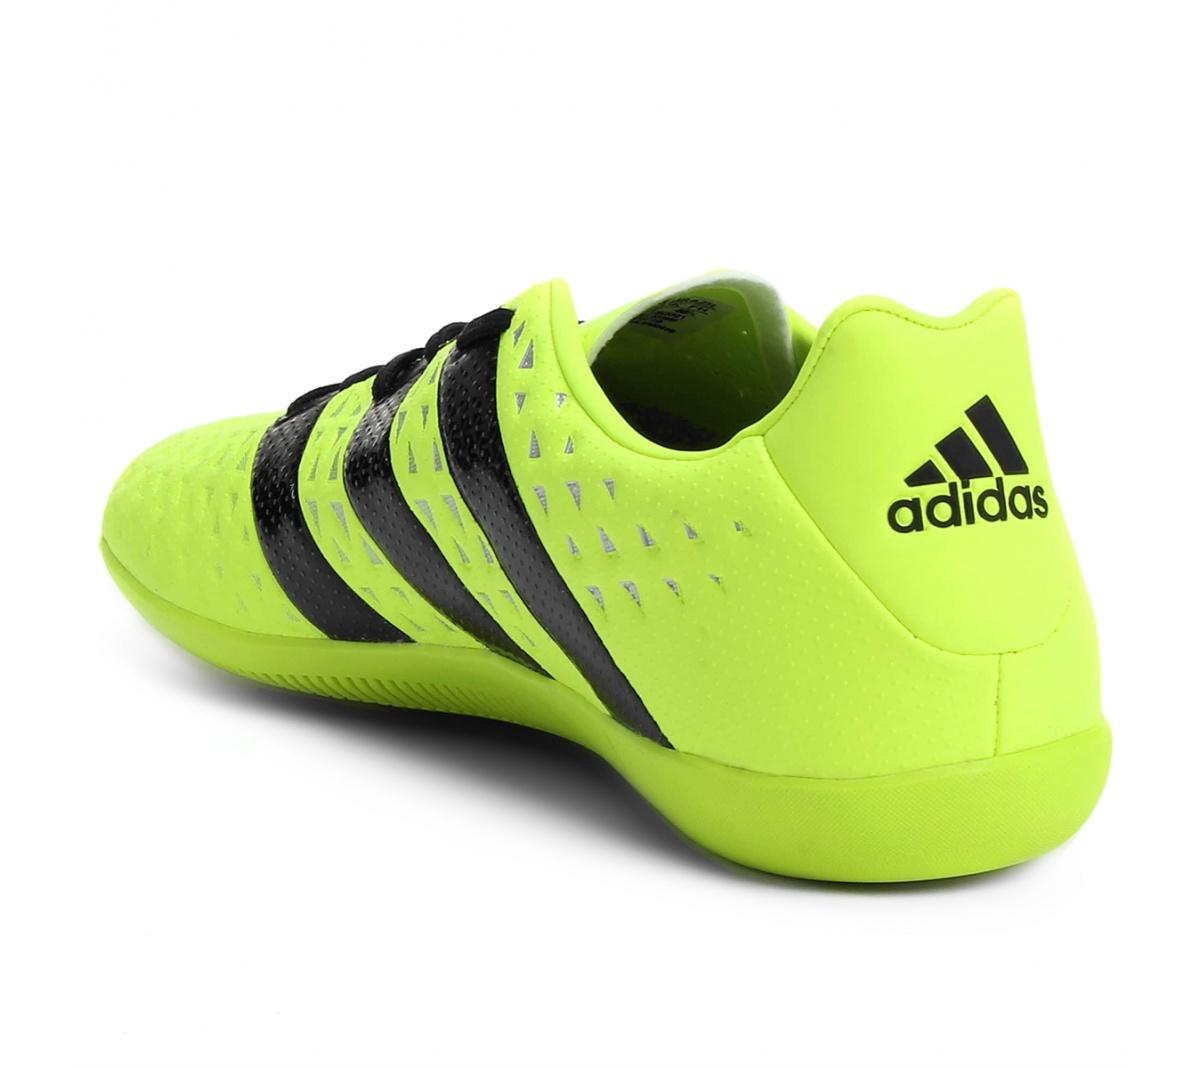 6ae3cd3202 Tenis Adidas Ace 16.3 Futsal - Mundo do Futebol